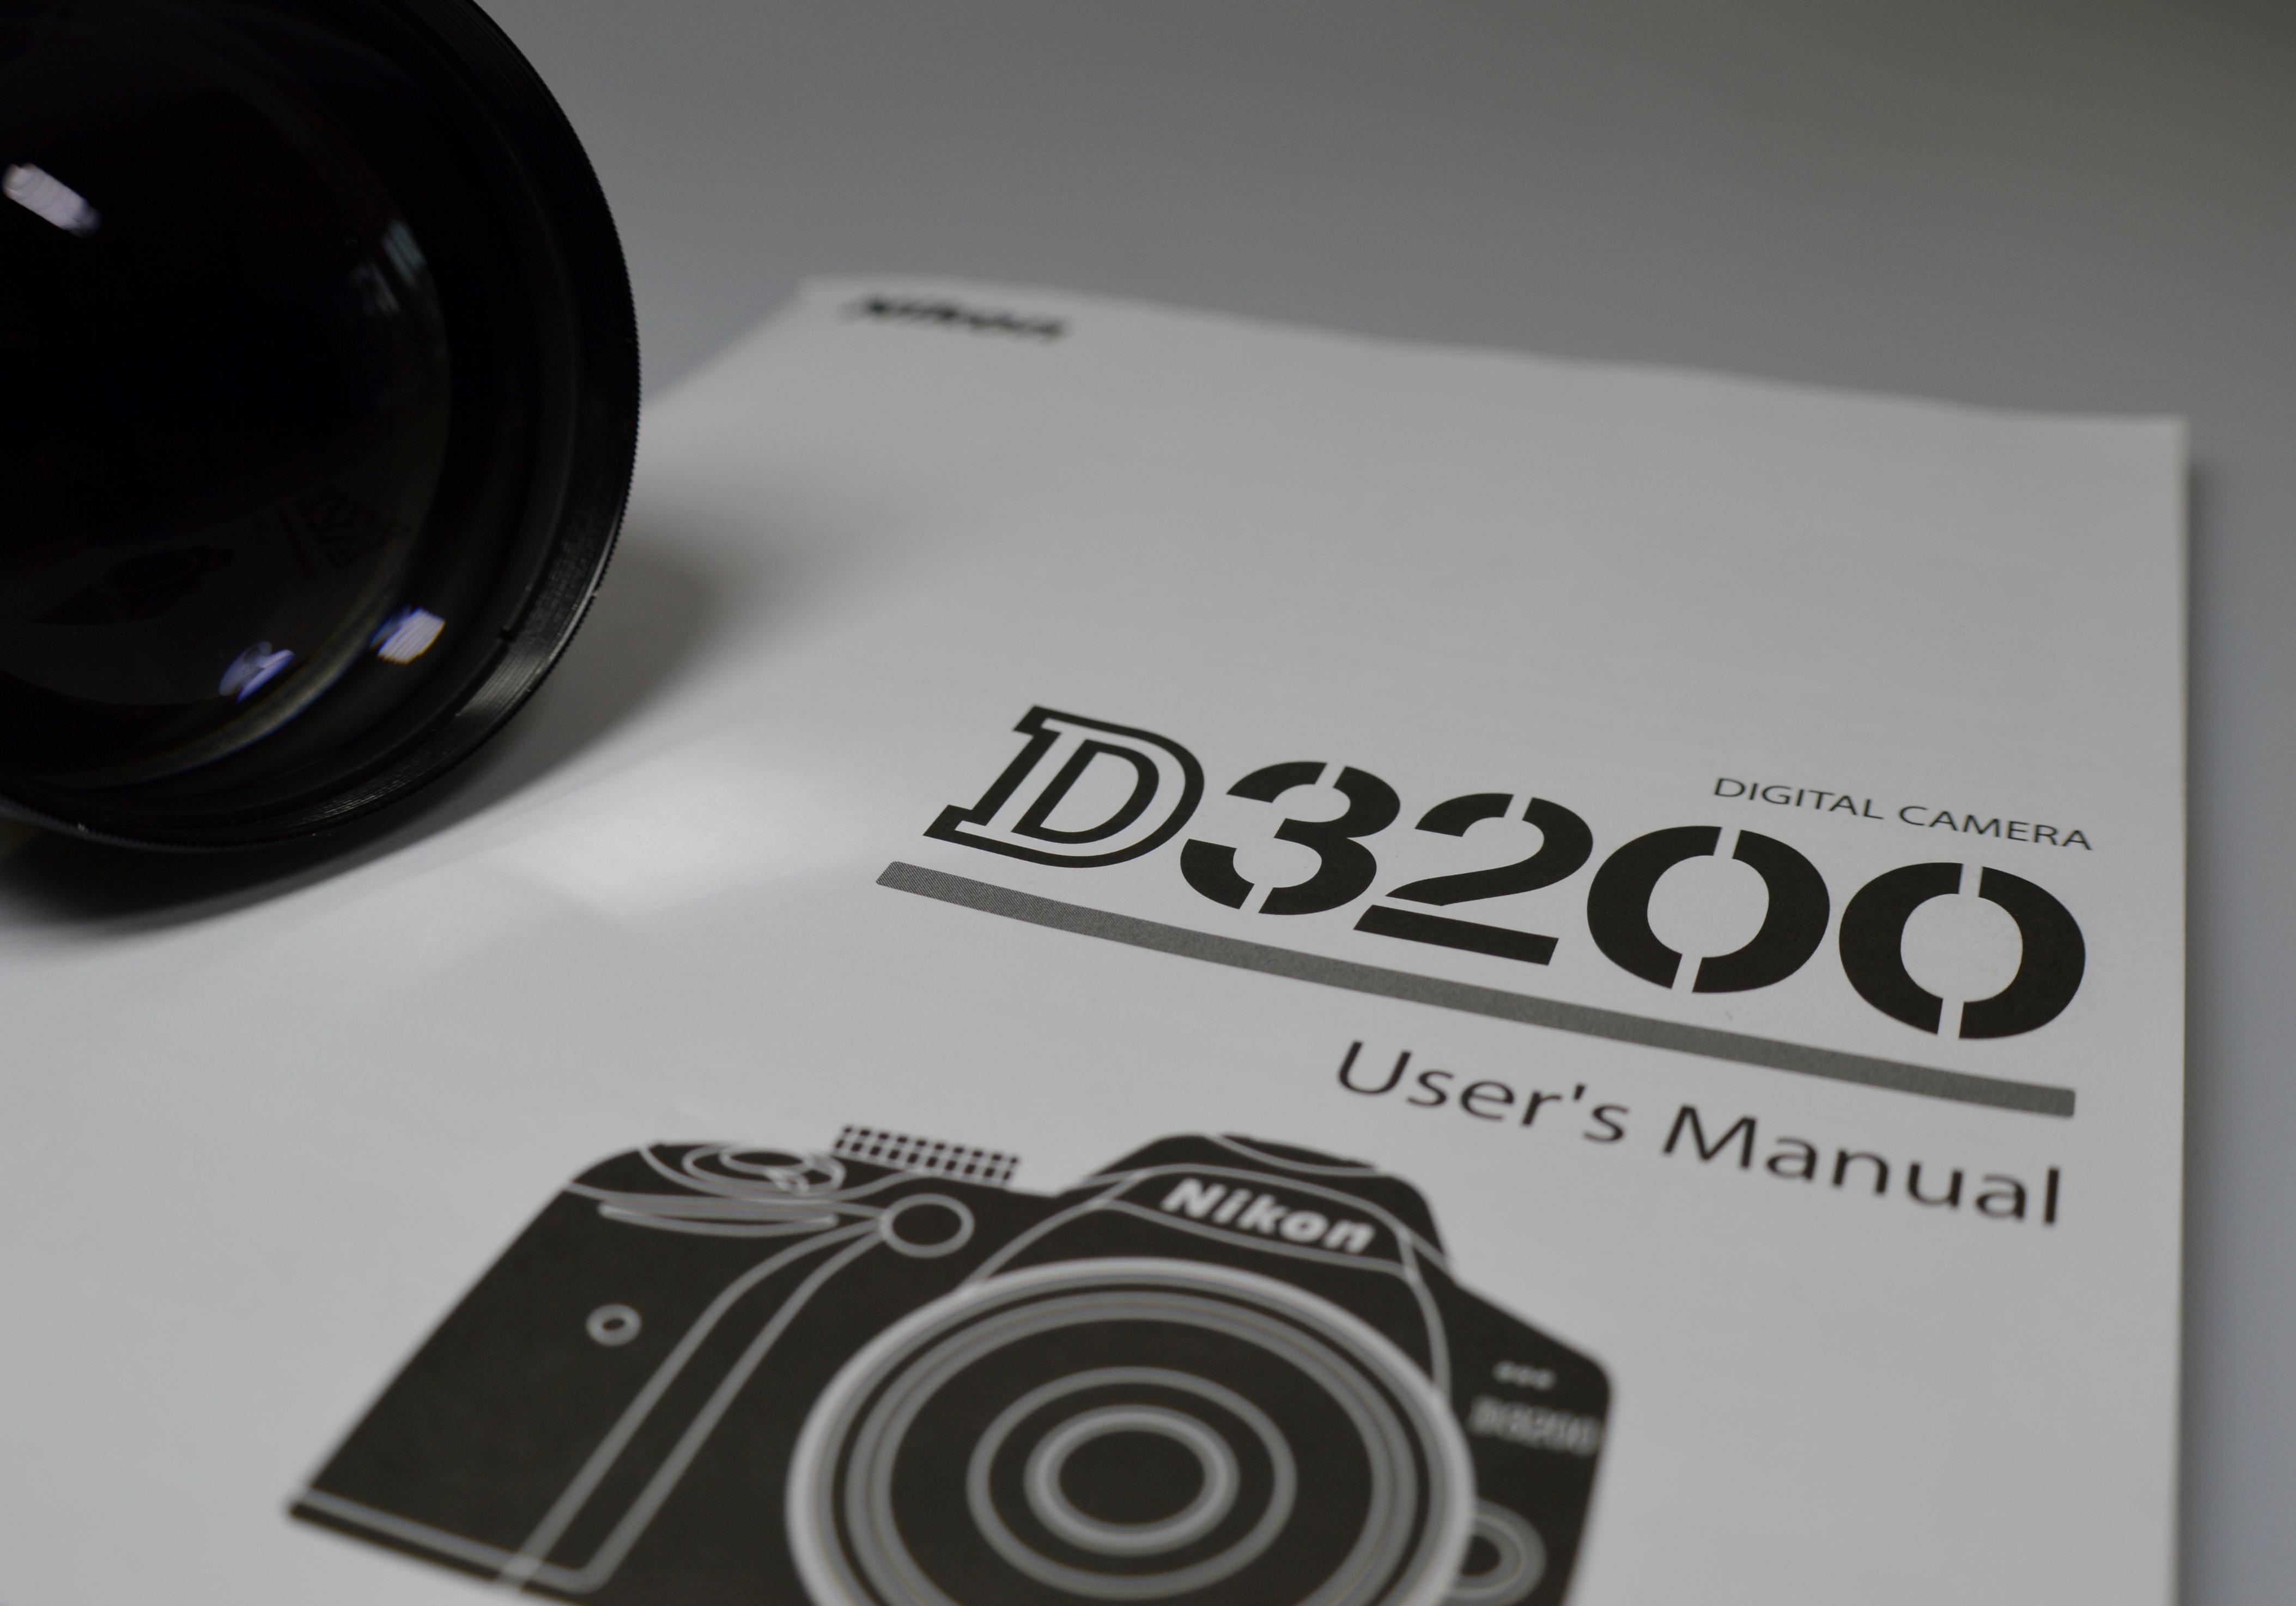 Iphone Entfernungsmesser Nikon : Kostenlose foto : kamera nikon marke produkt schriftart